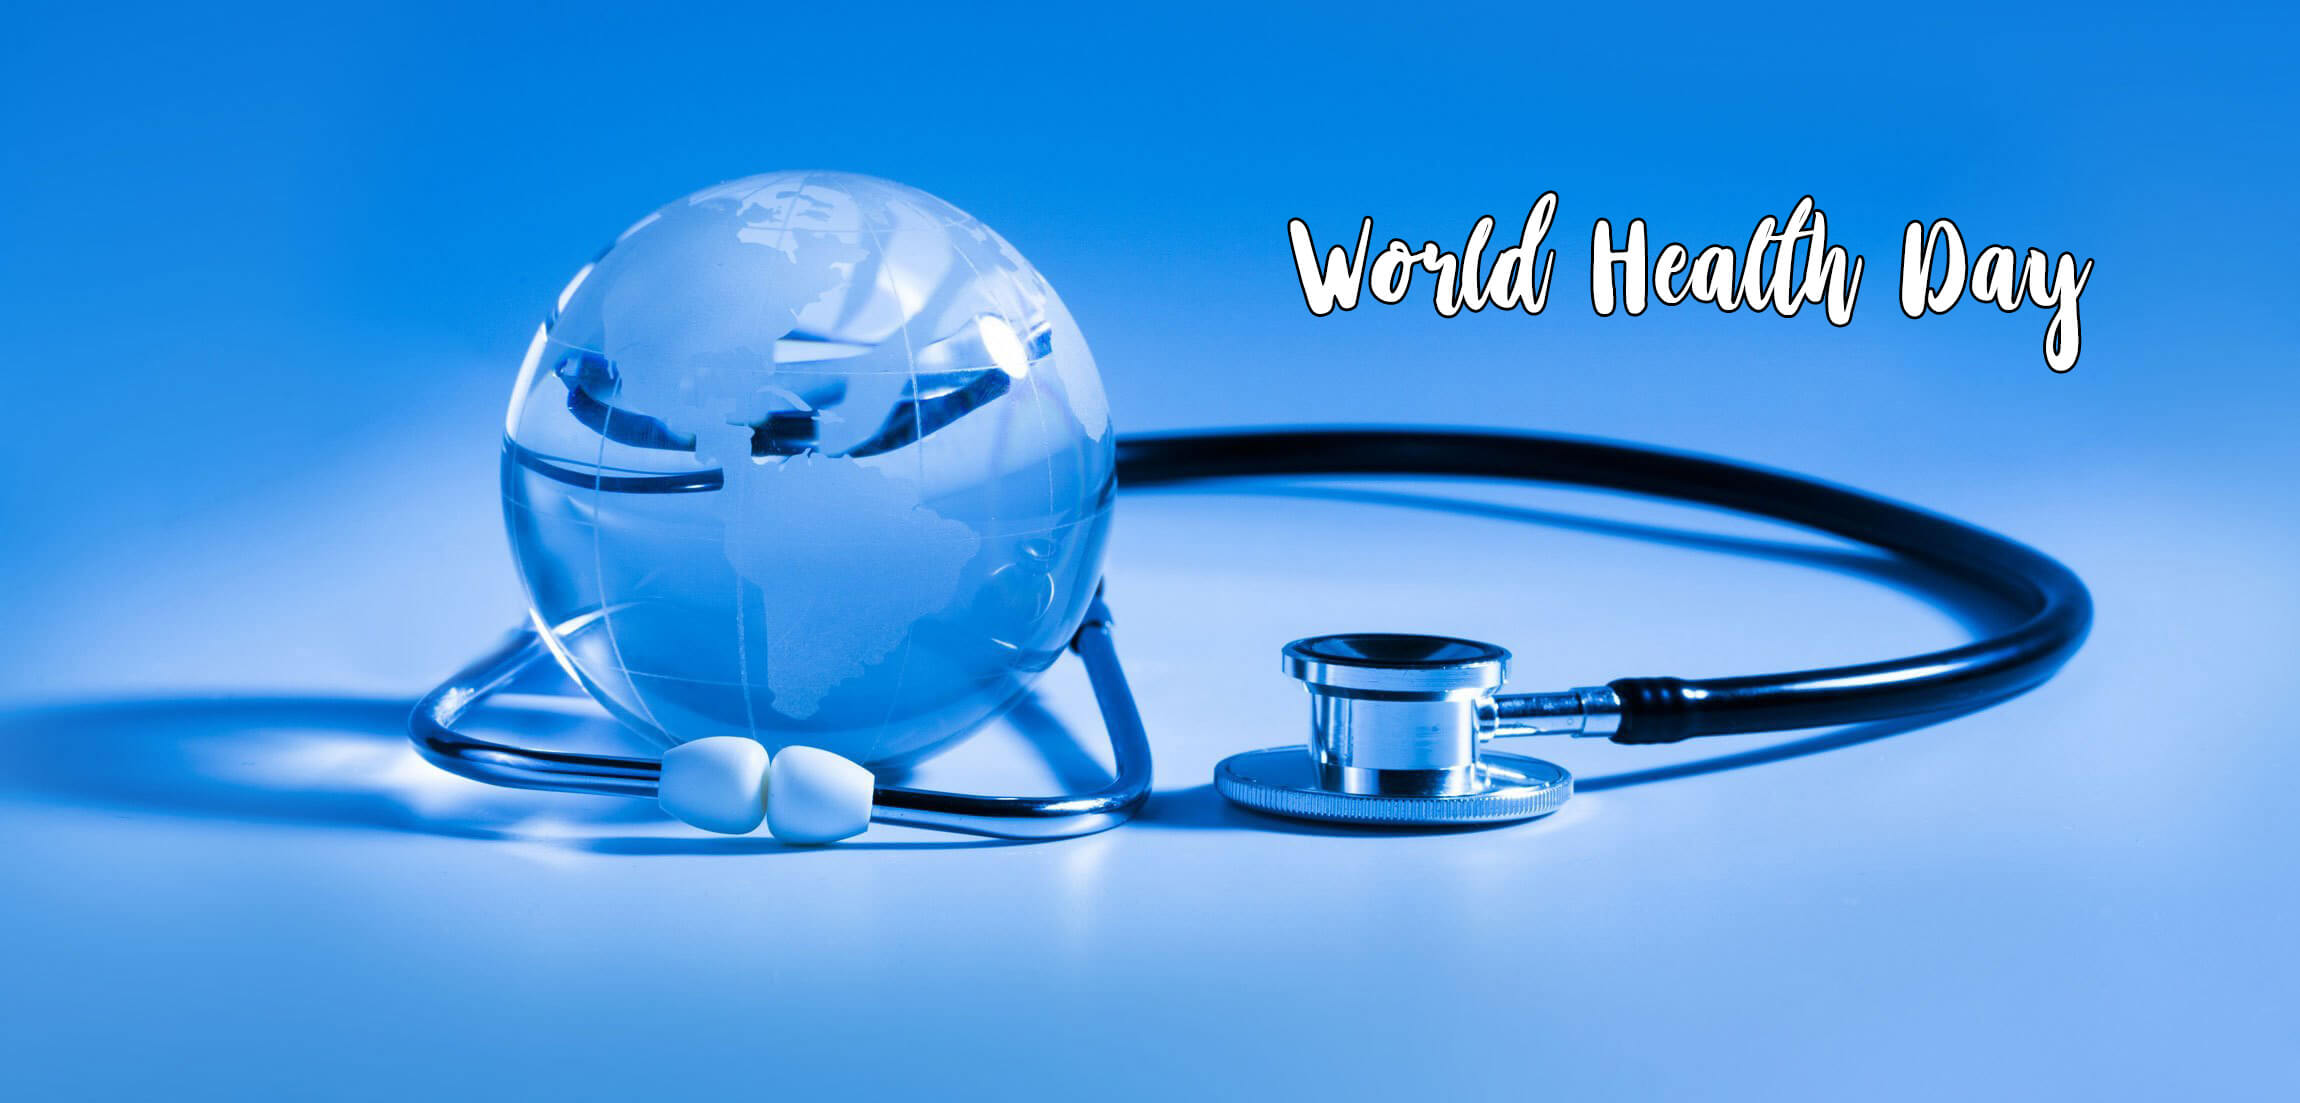 happy world health day globe crystal stethoscope wide hd wallpaper